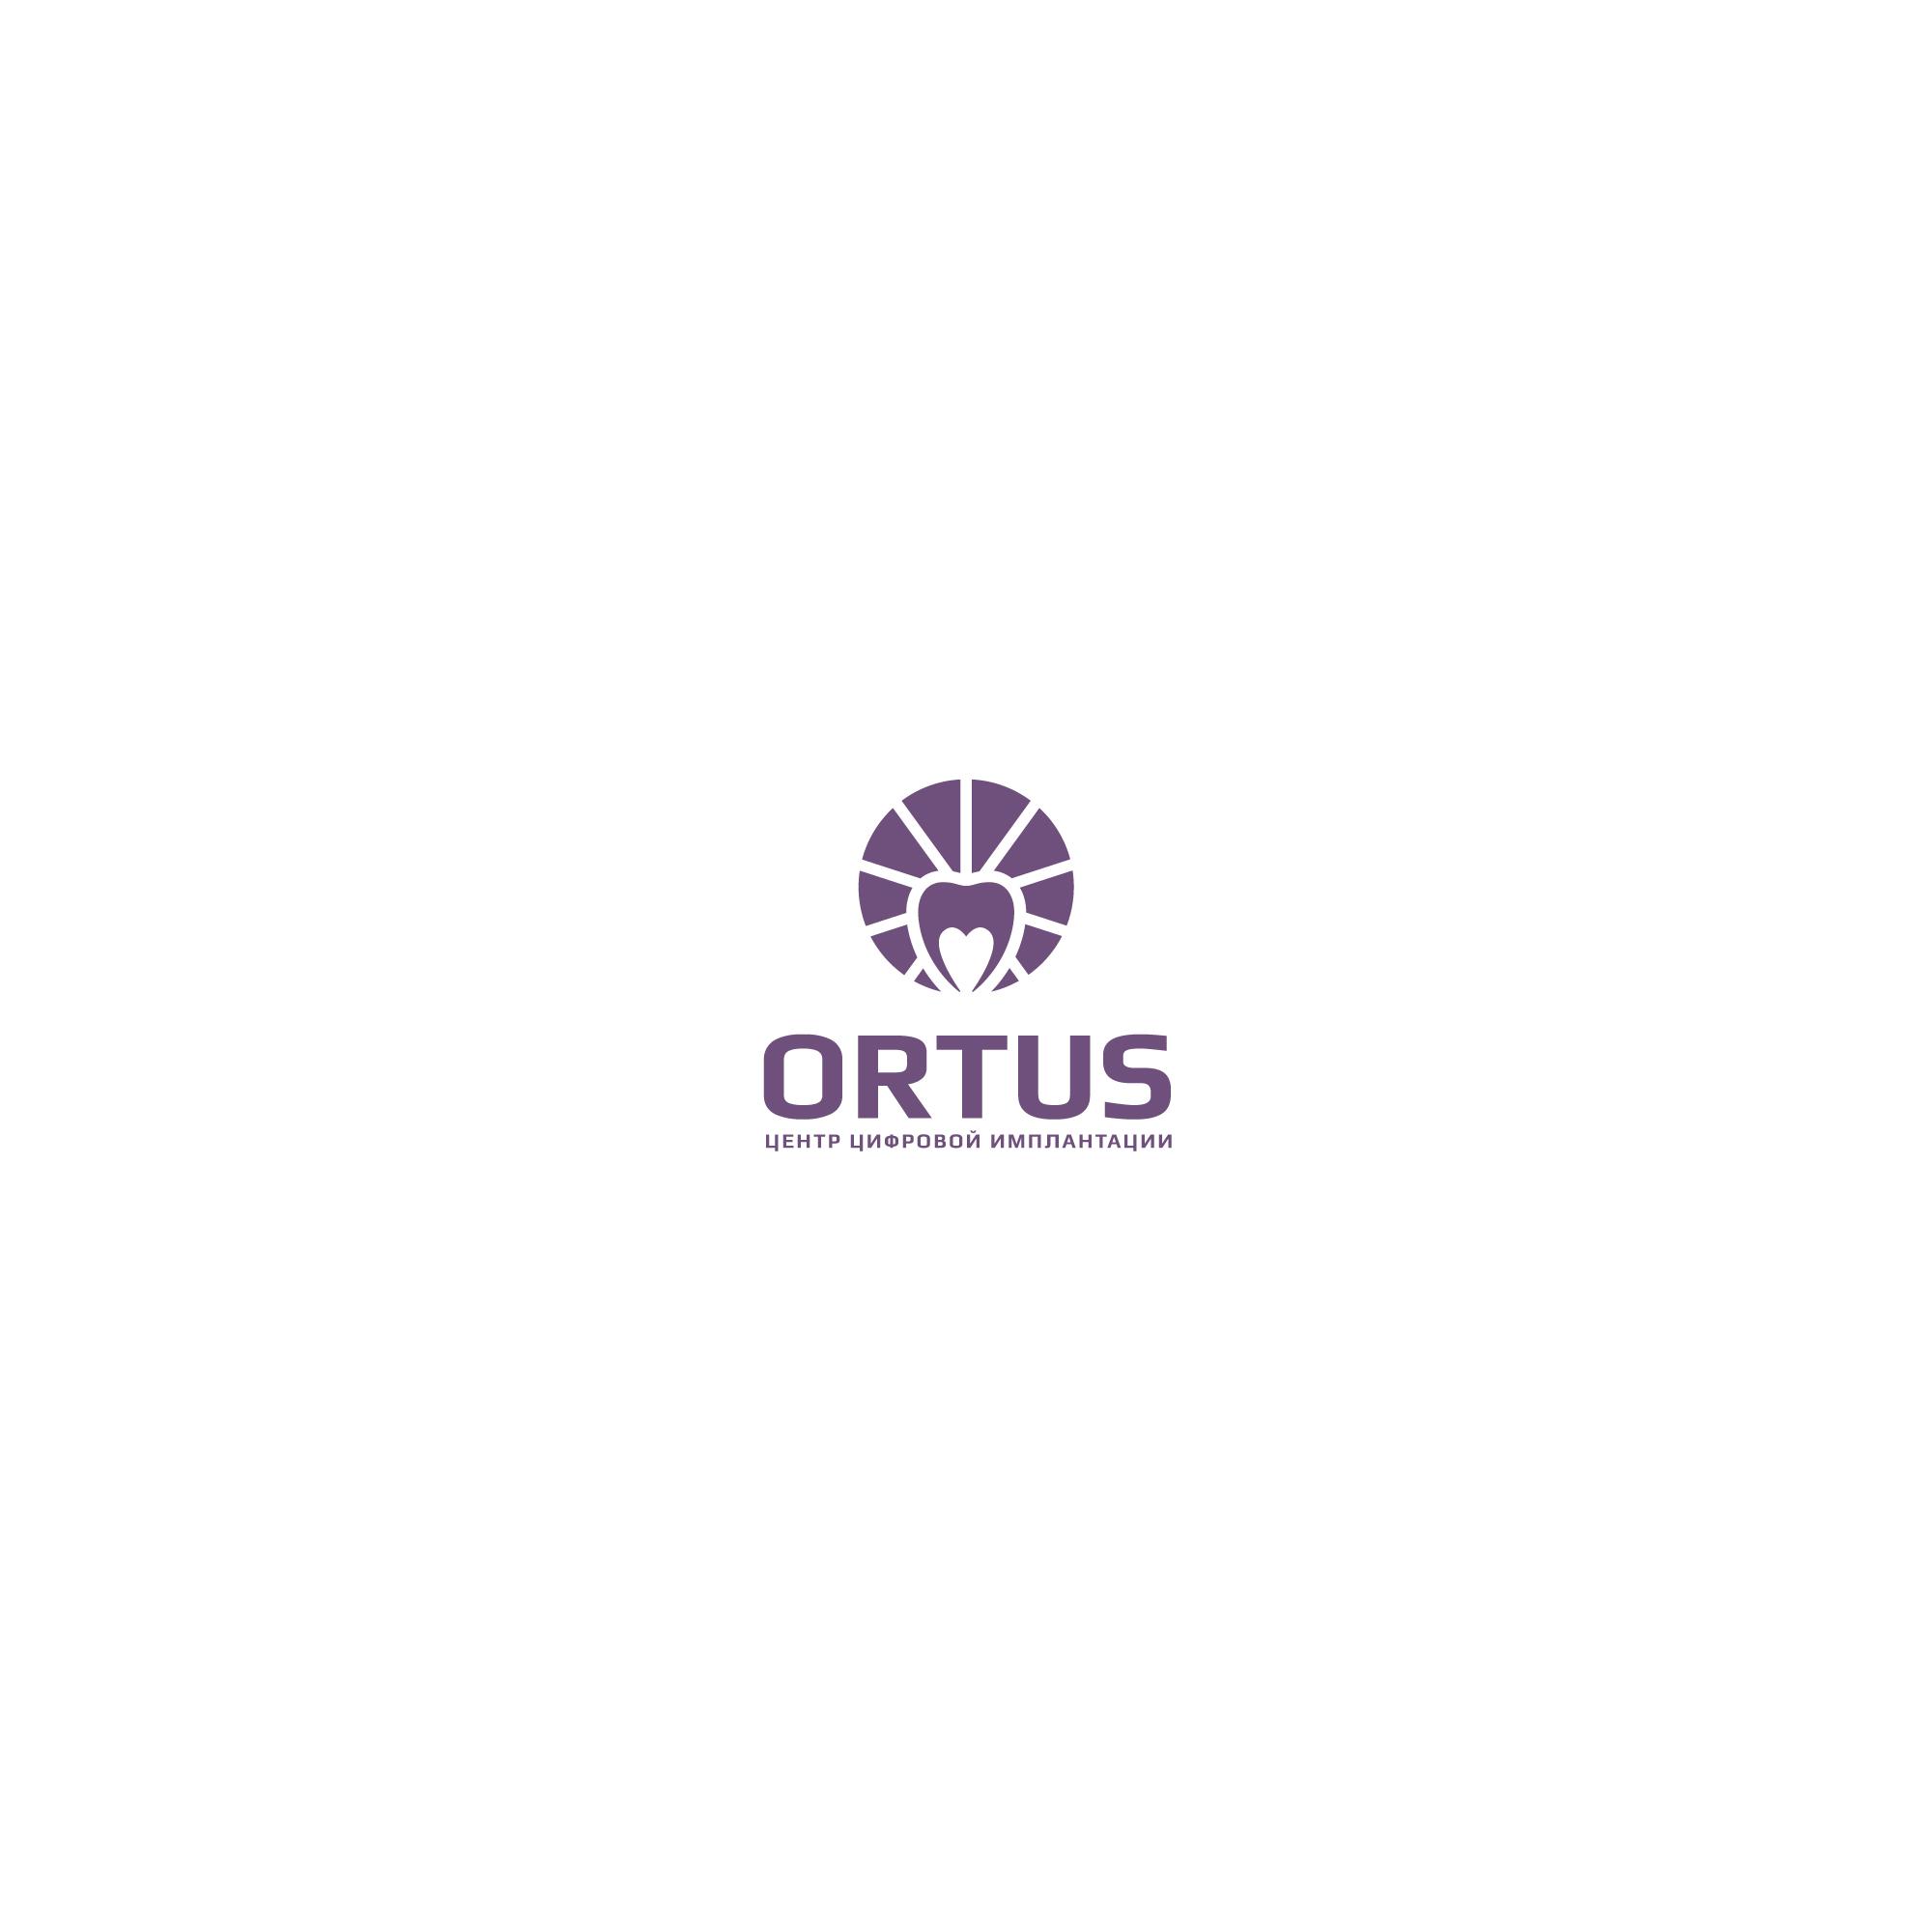 Ребрендинг логотипа для Стоматологии фото f_10060017e647fee0.jpg